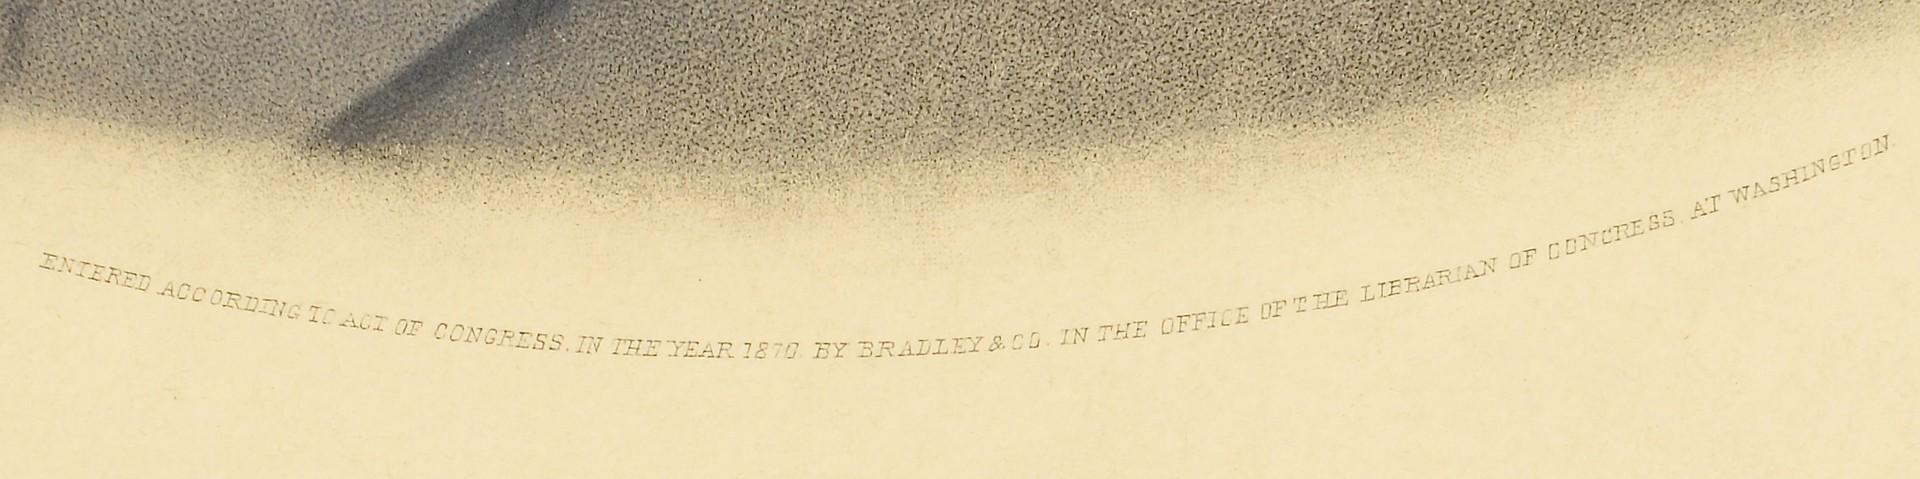 Lot 551: Robert E. Lee Memorial Engraved Portrait, 1870